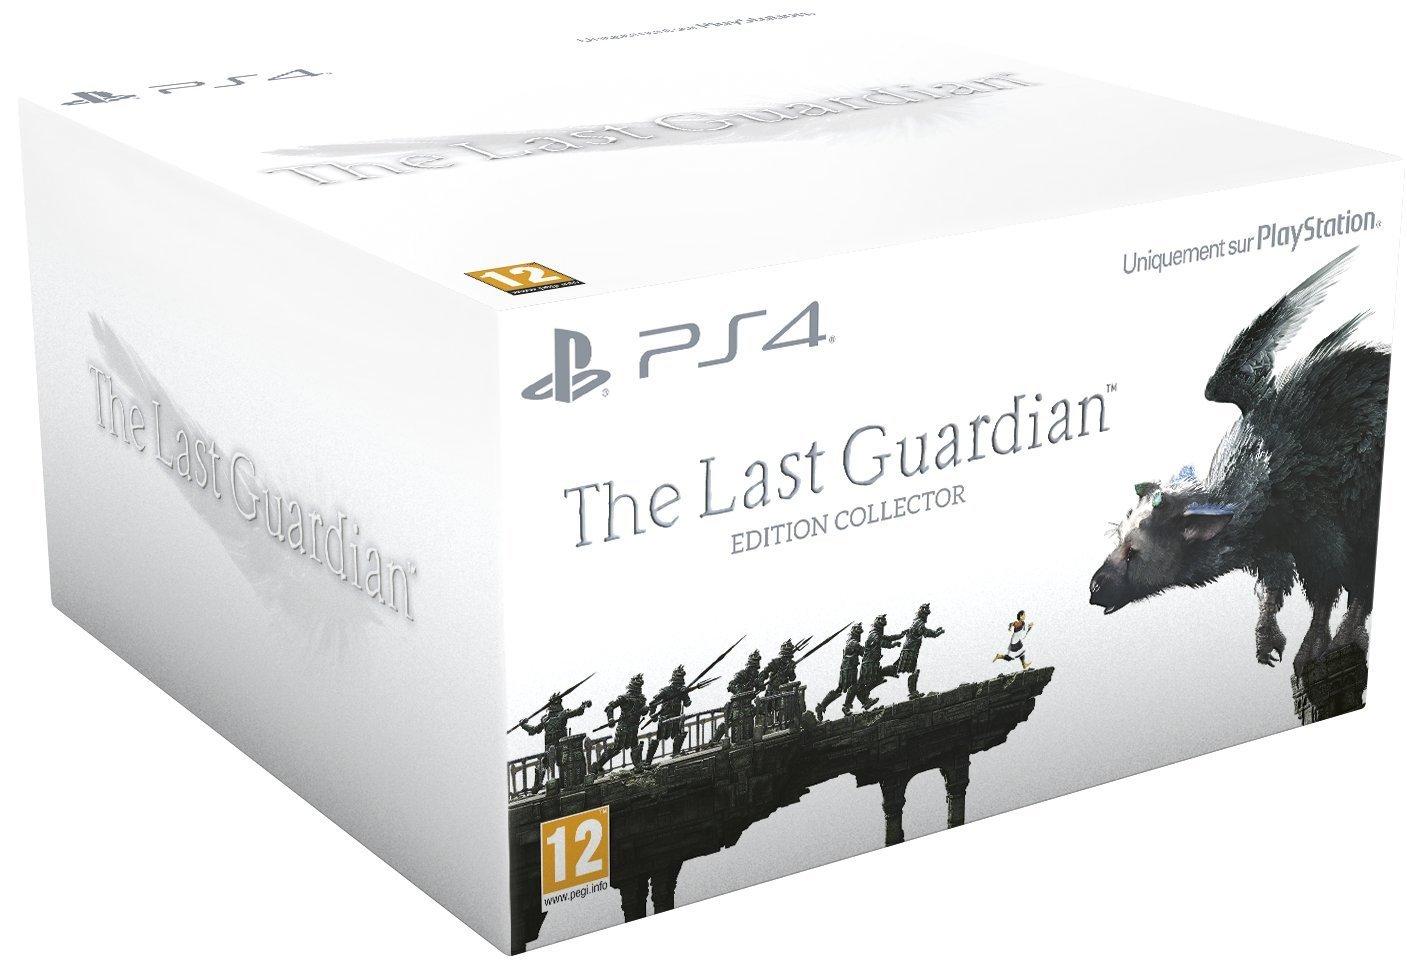 TheLastGuardianCollector The Last Guardian - Le collector - Préco ouverte